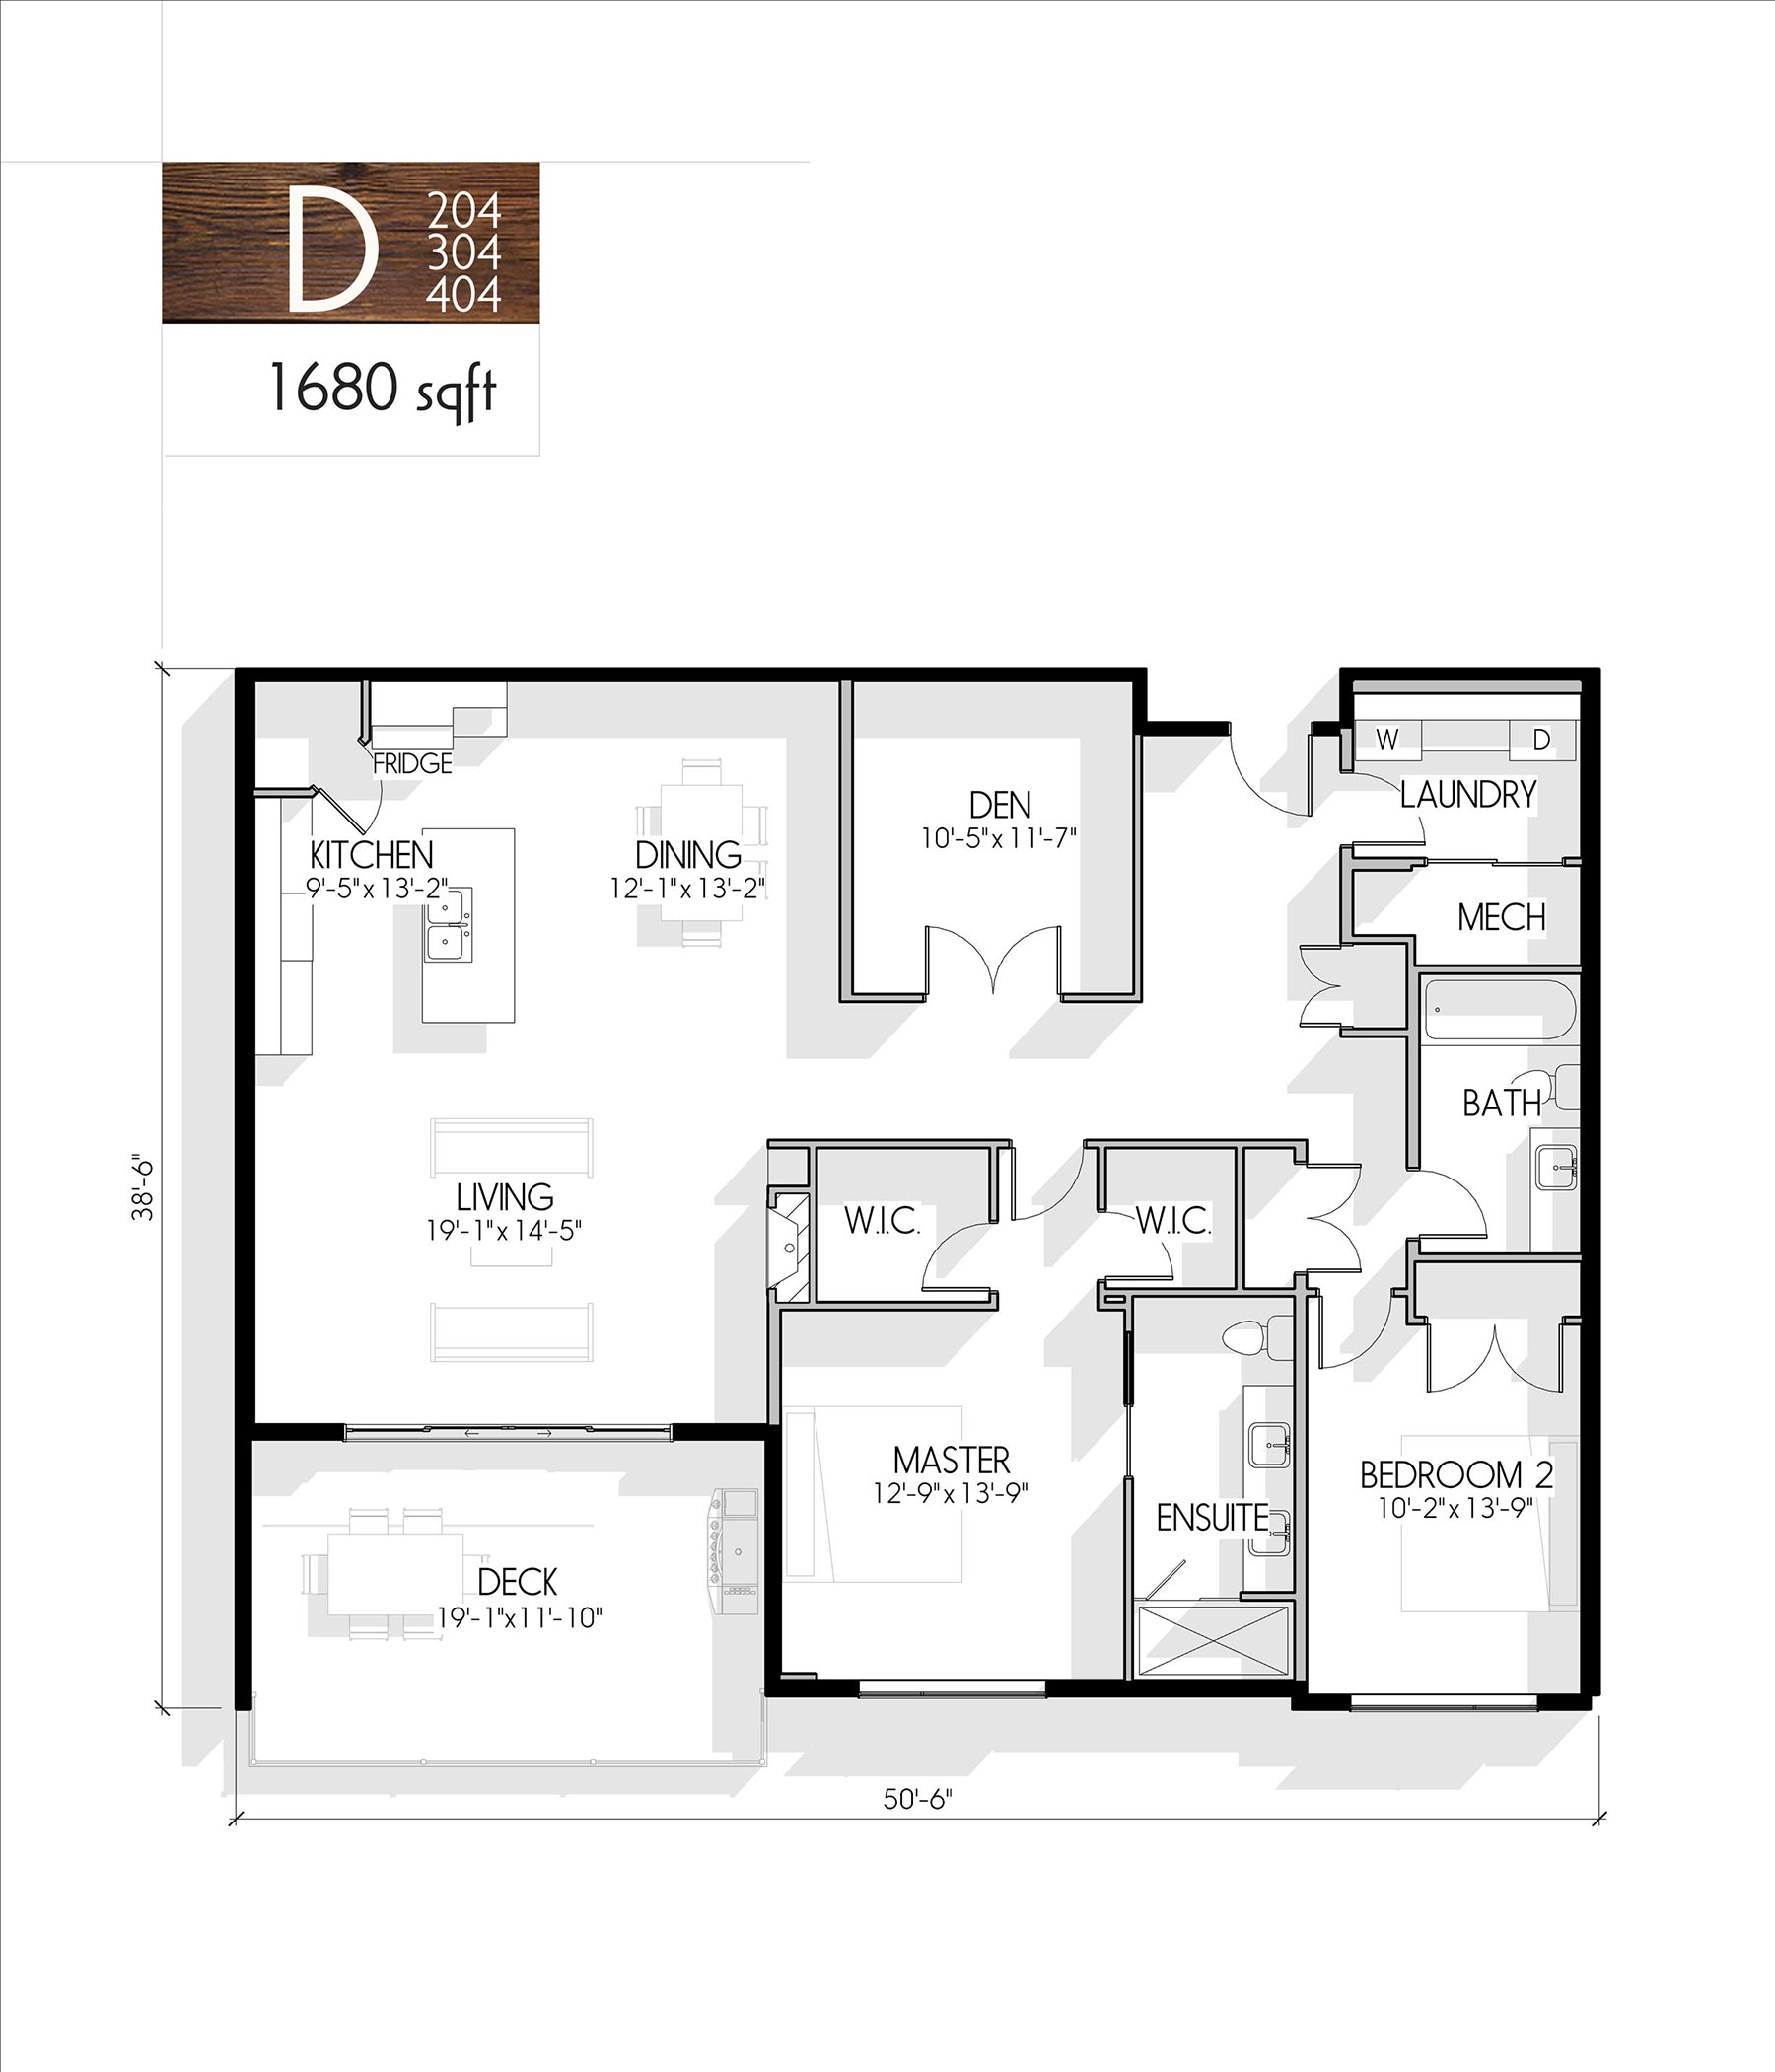 Parkplace-Floorplan-D